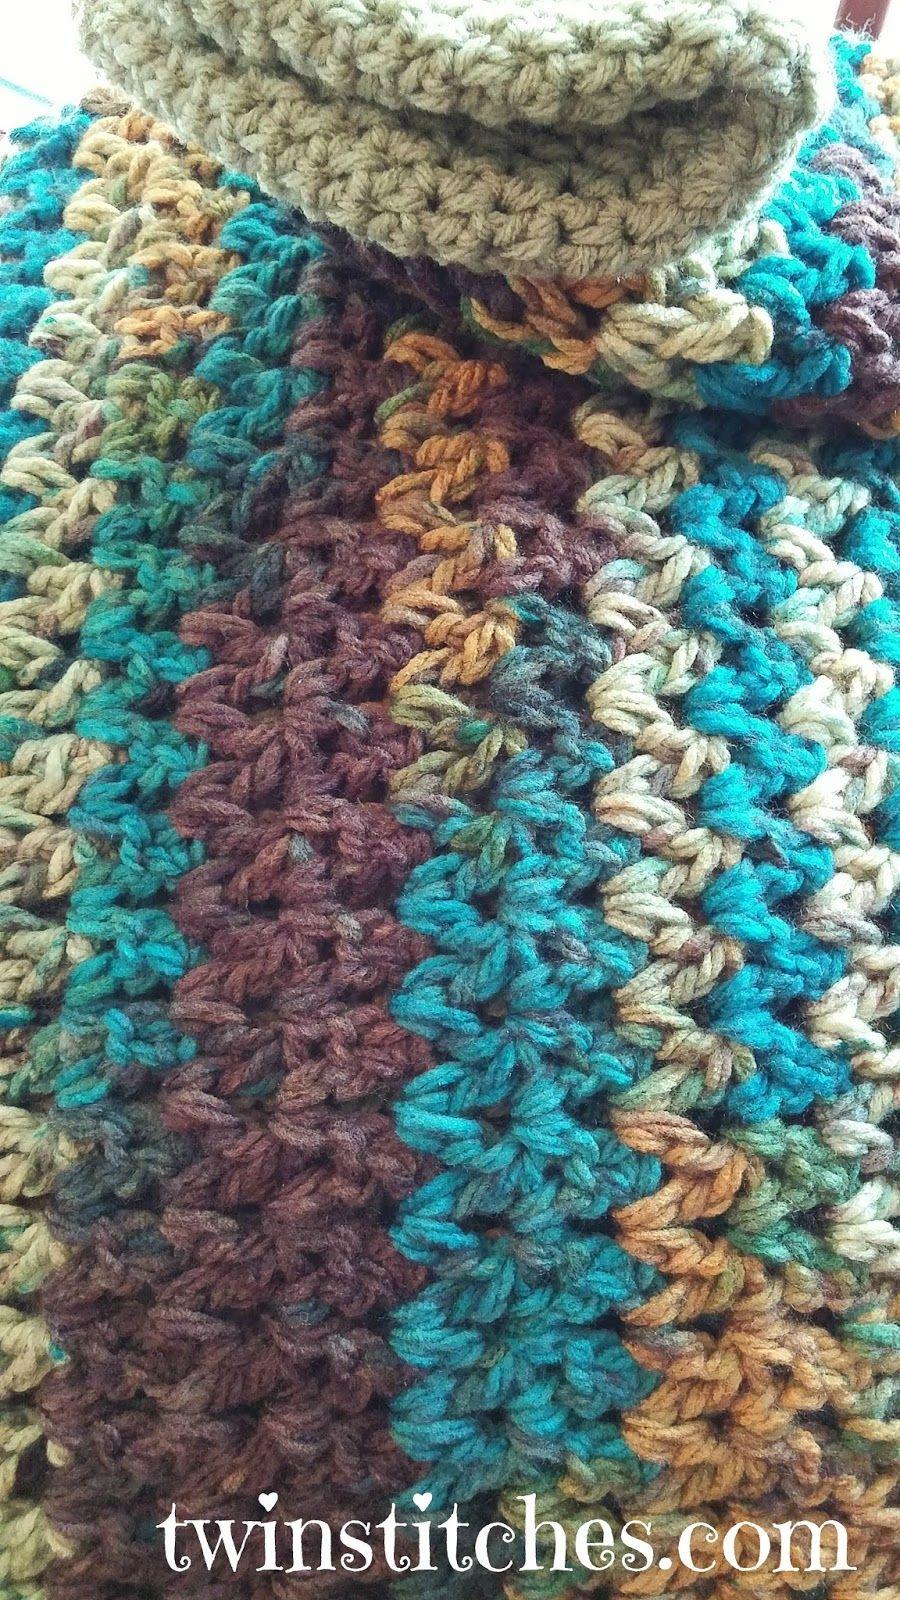 Tw-In Stitches: Sedona Wobbly Stripes Blanket - Free Pattern | Tw-In ...